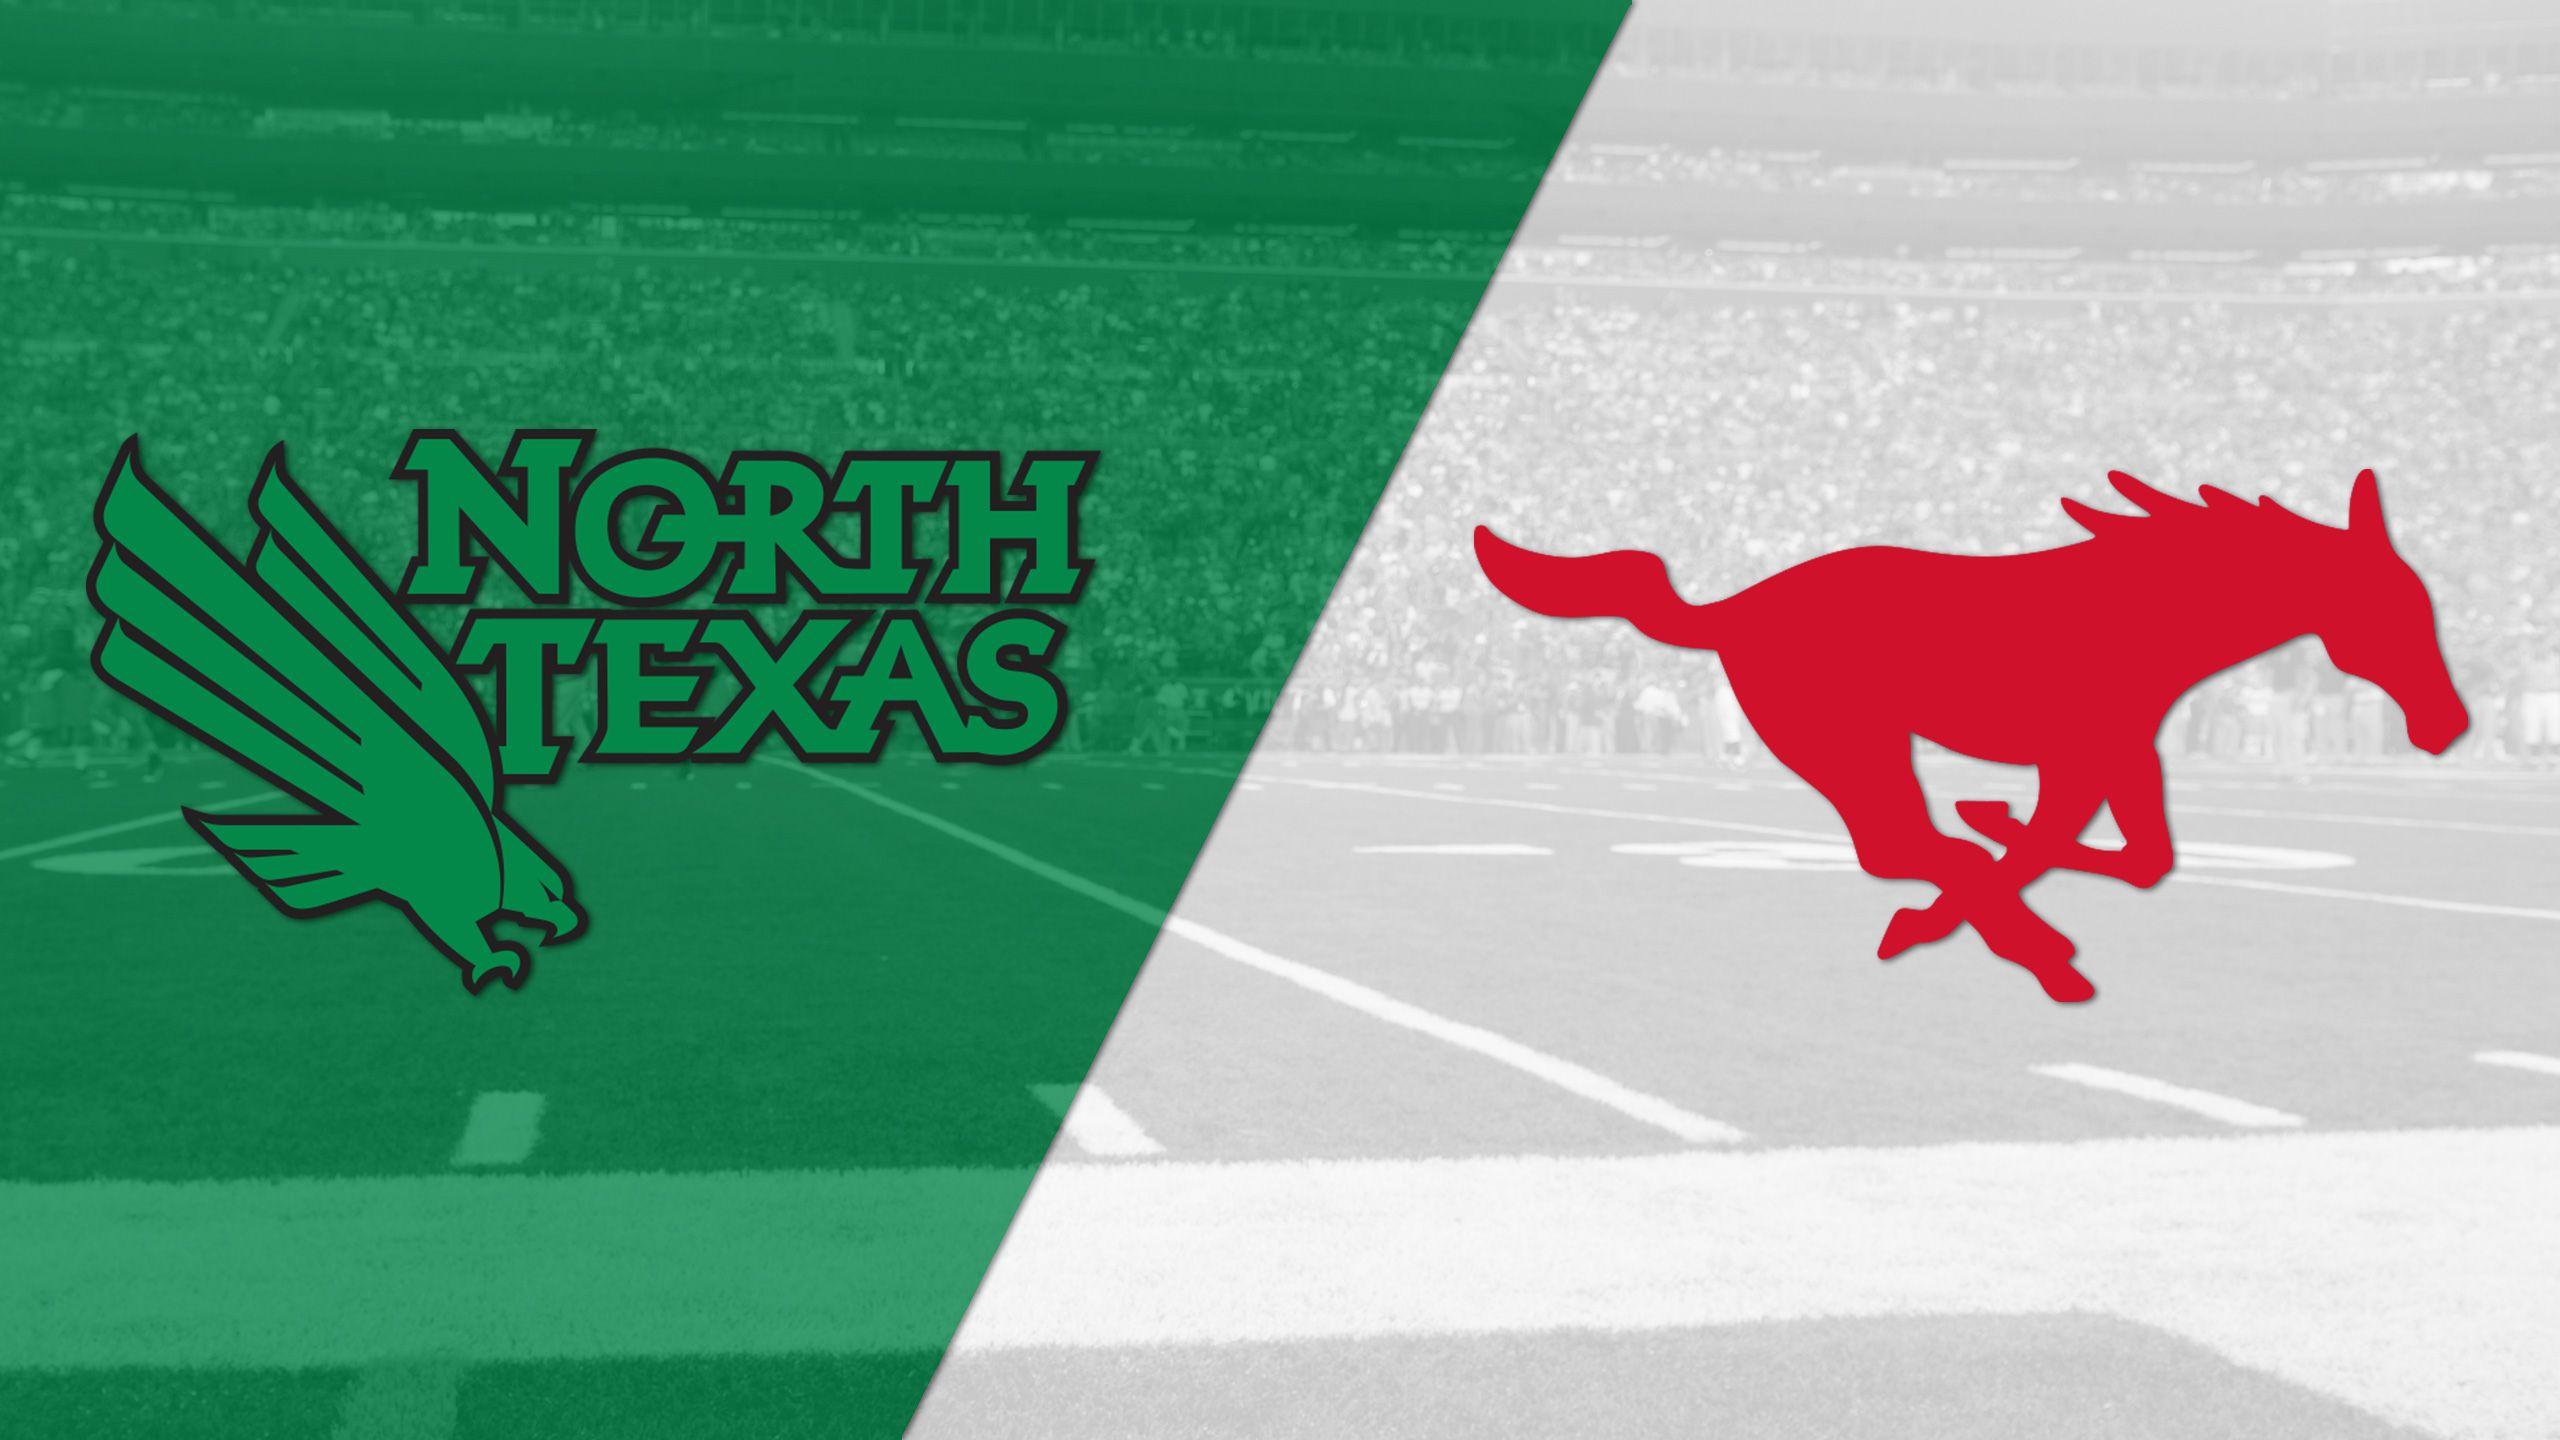 North Texas vs. SMU (Football)